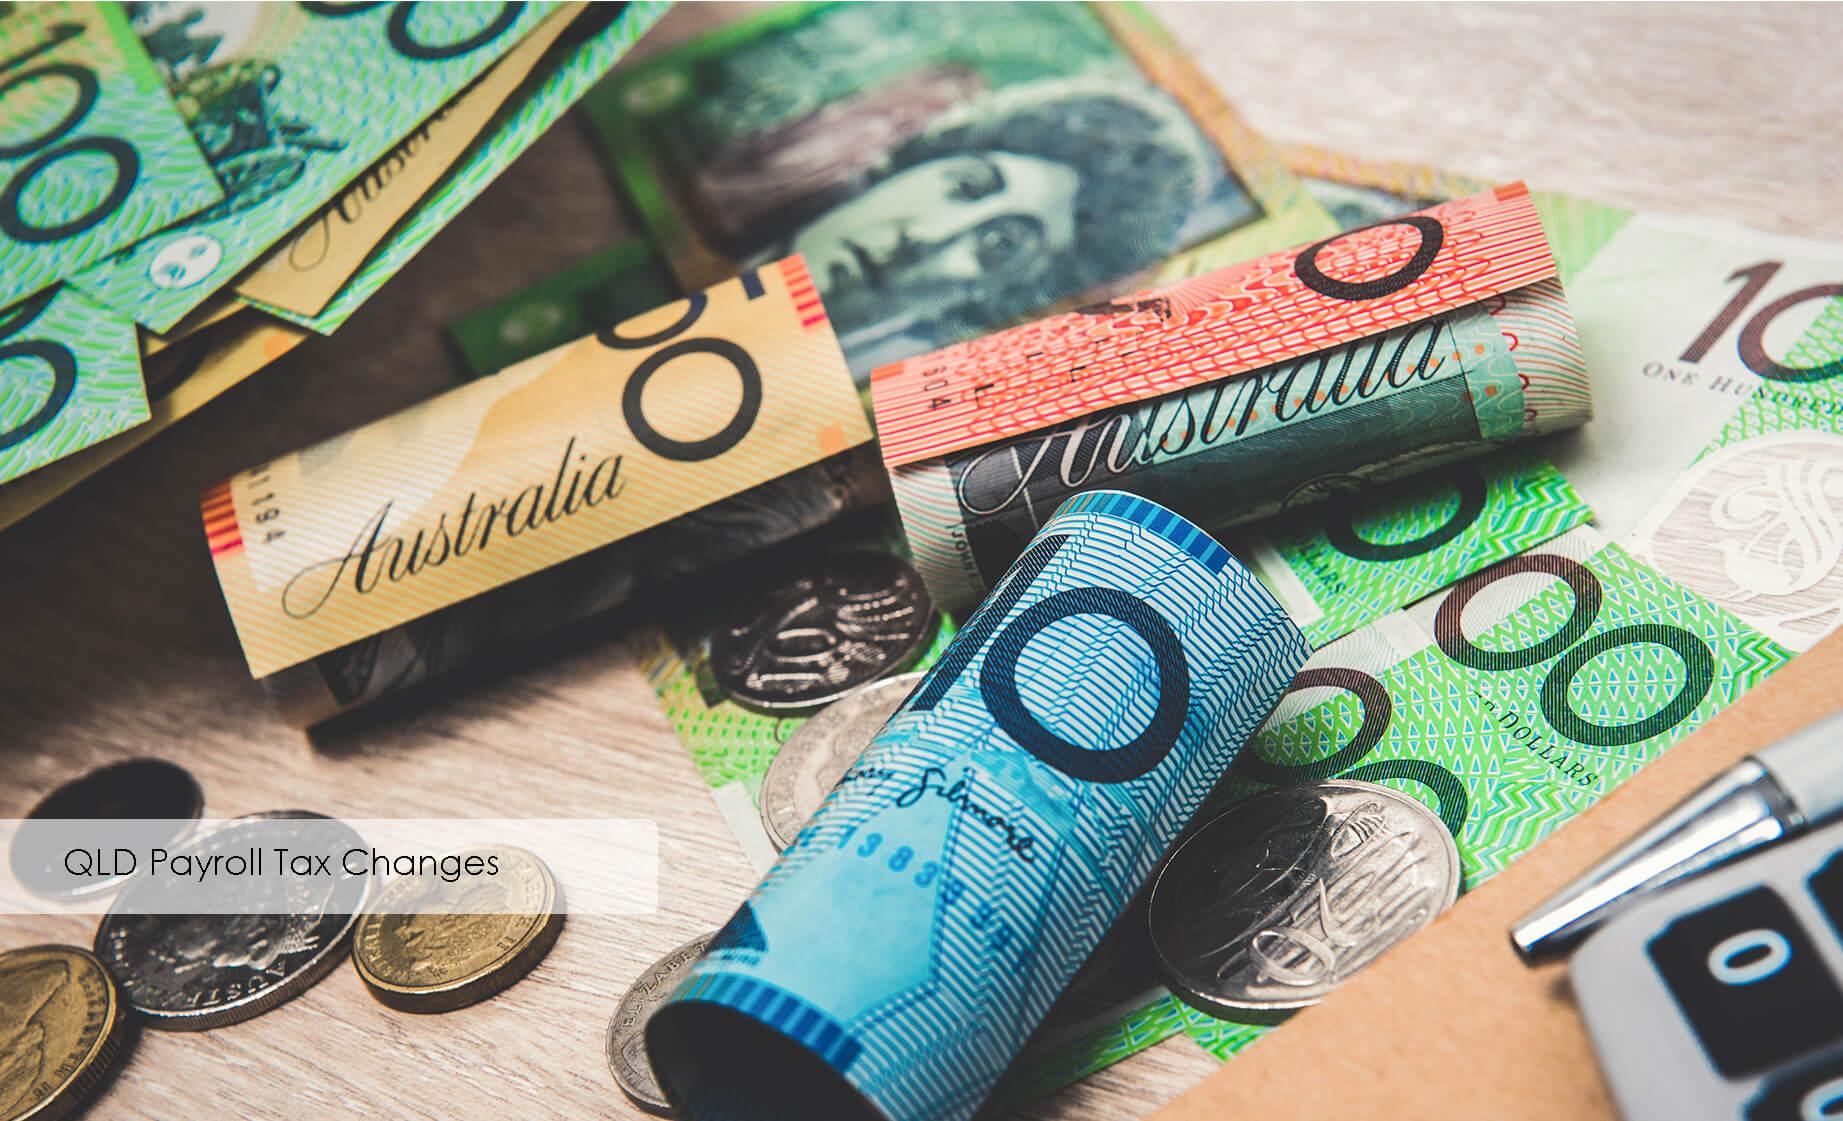 QLD Payroll Tax Changes